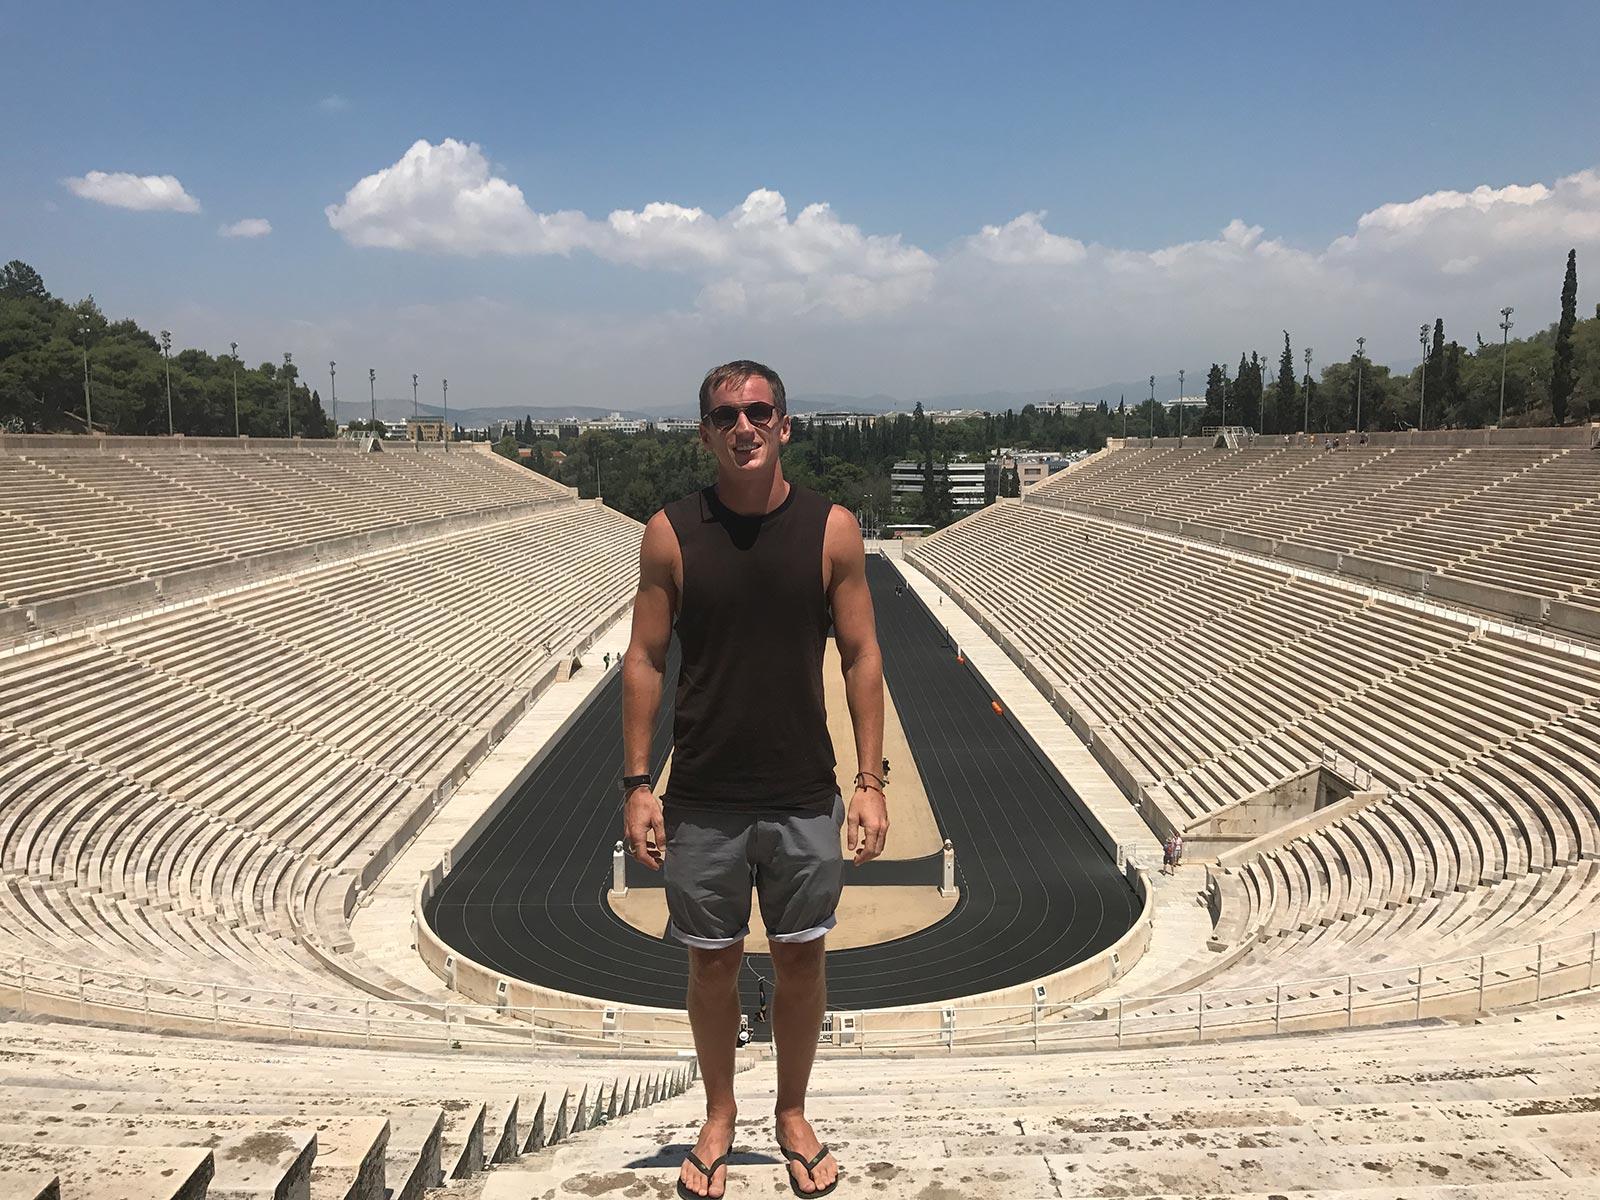 David Simpson at Panathenaic Stadium in Athens, Greece. Athens has me